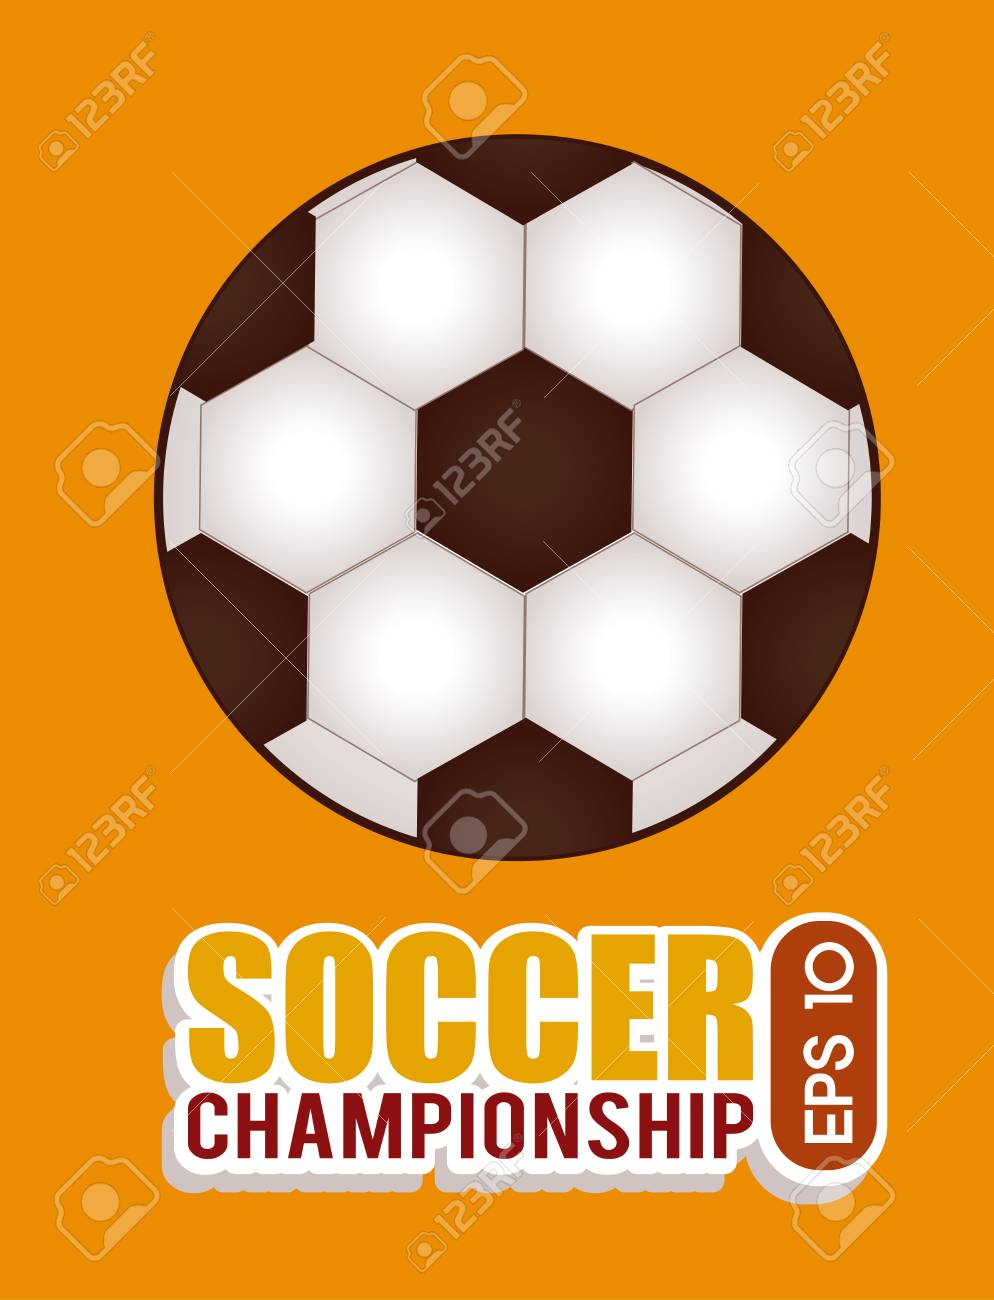 soccer design over orange   background  vector illustration Stock Vector - 24963994